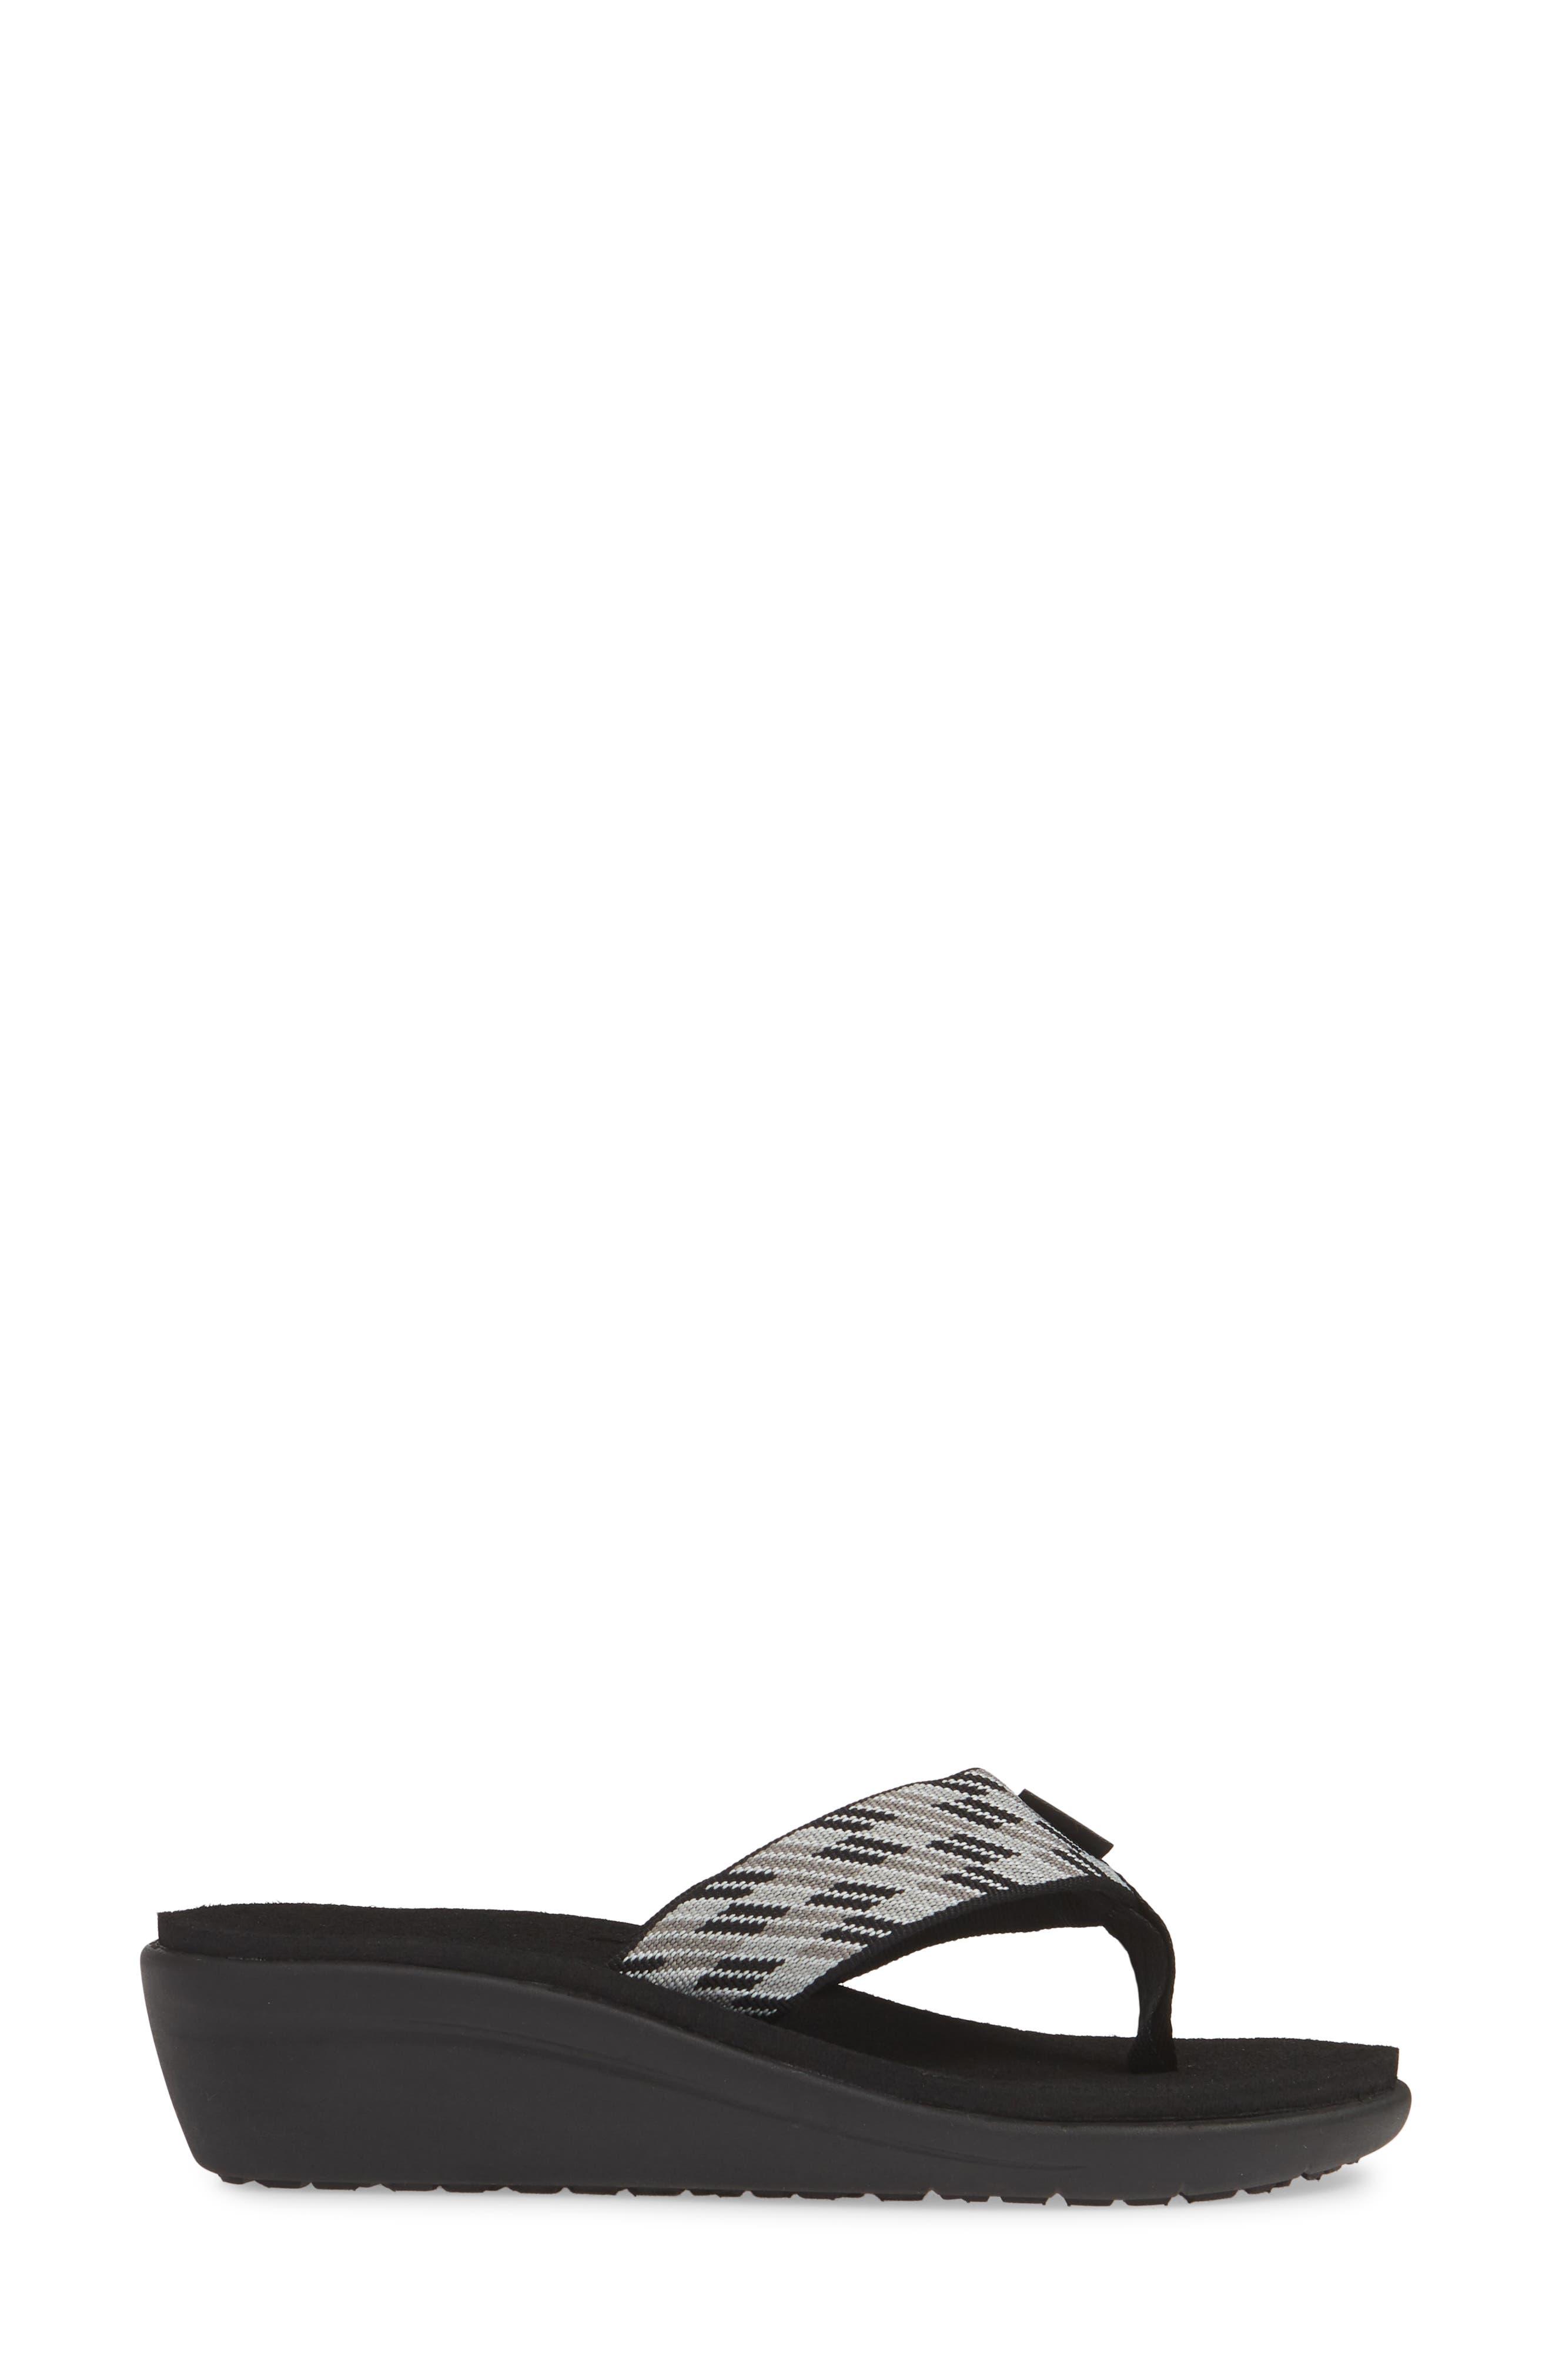 TEVA, Voya Wedge Flip Flop, Alternate thumbnail 3, color, BLACK WHITE FABRIC